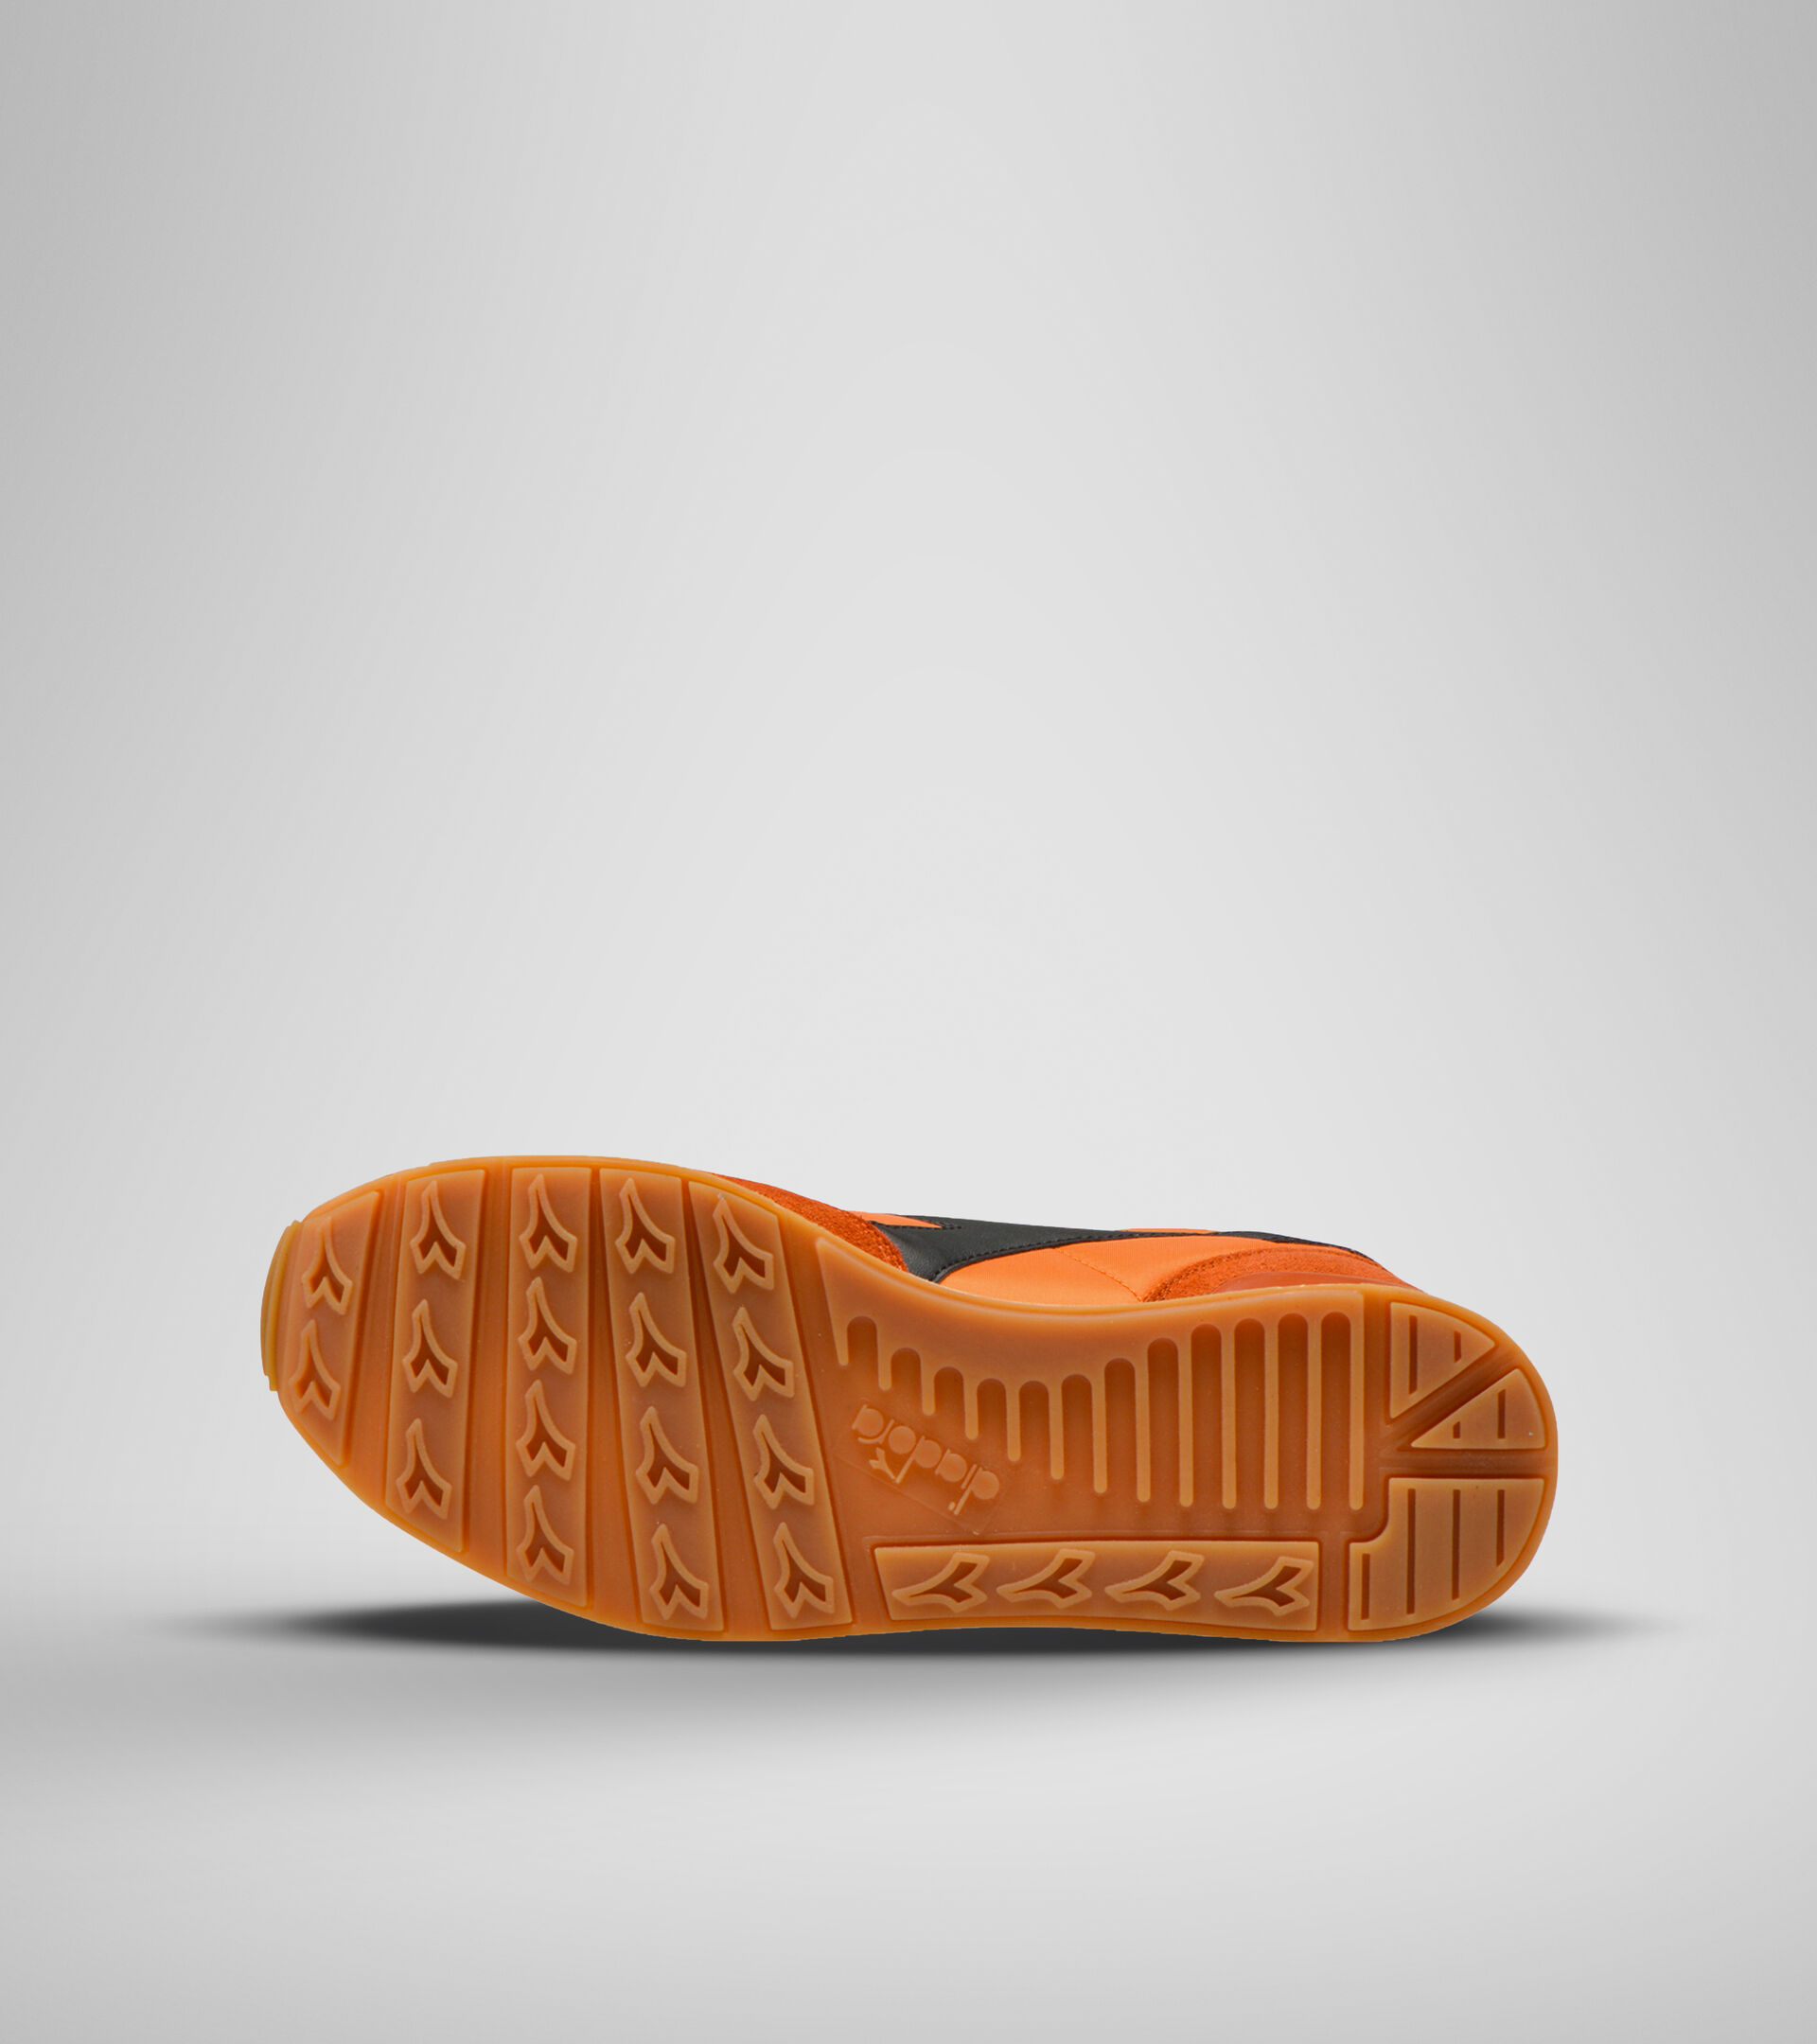 Footwear Sportswear UNISEX CAMARO MRRN FIAMMA DORATA/MRRN SOLE D Diadora